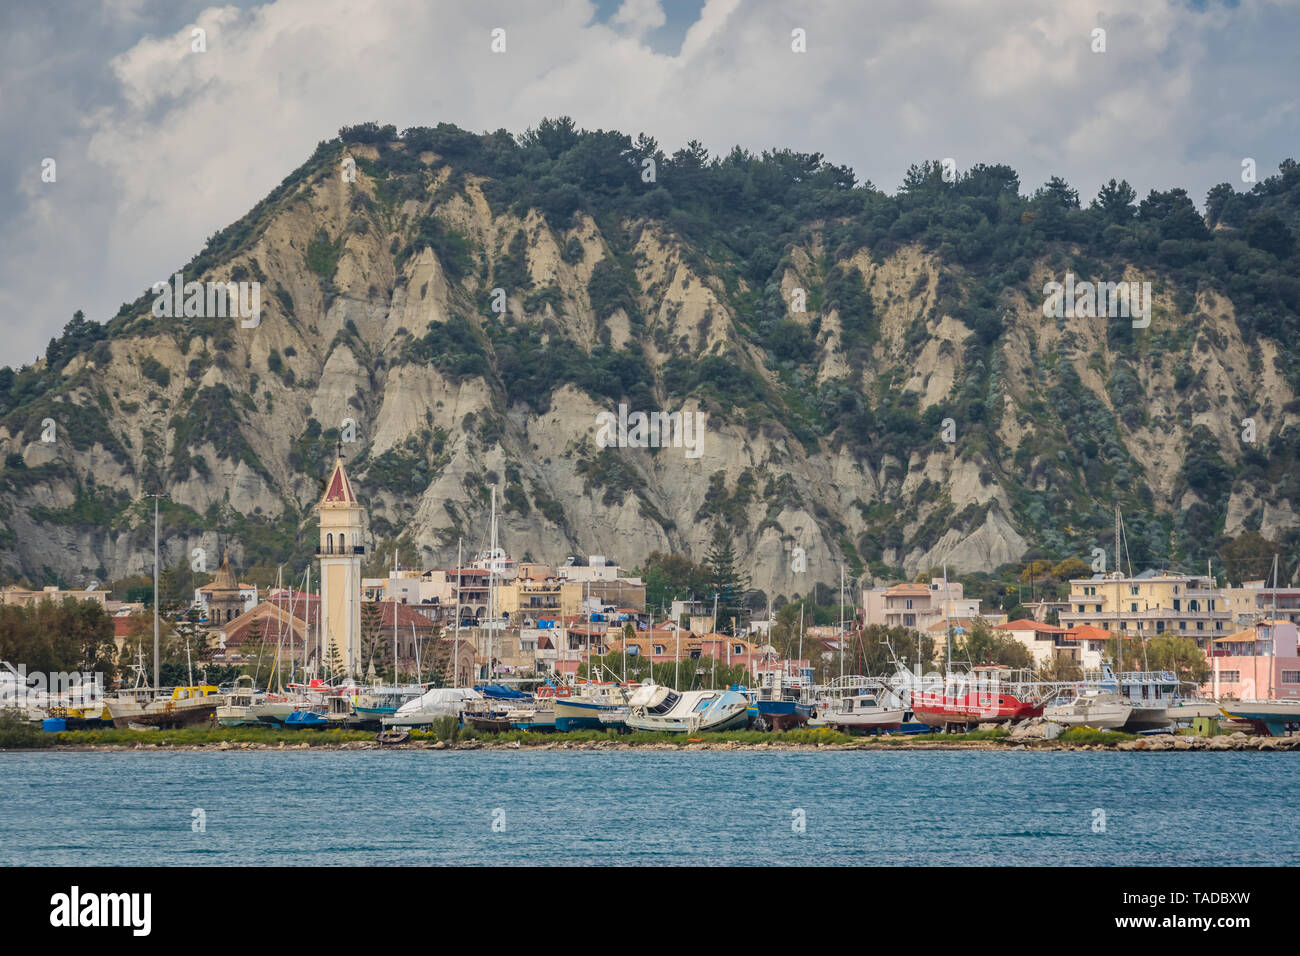 Zakynthos, Greece -  April 2019 : Zakynthos Town as seen from the sea, Zante Island, Ionian islands - Stock Image